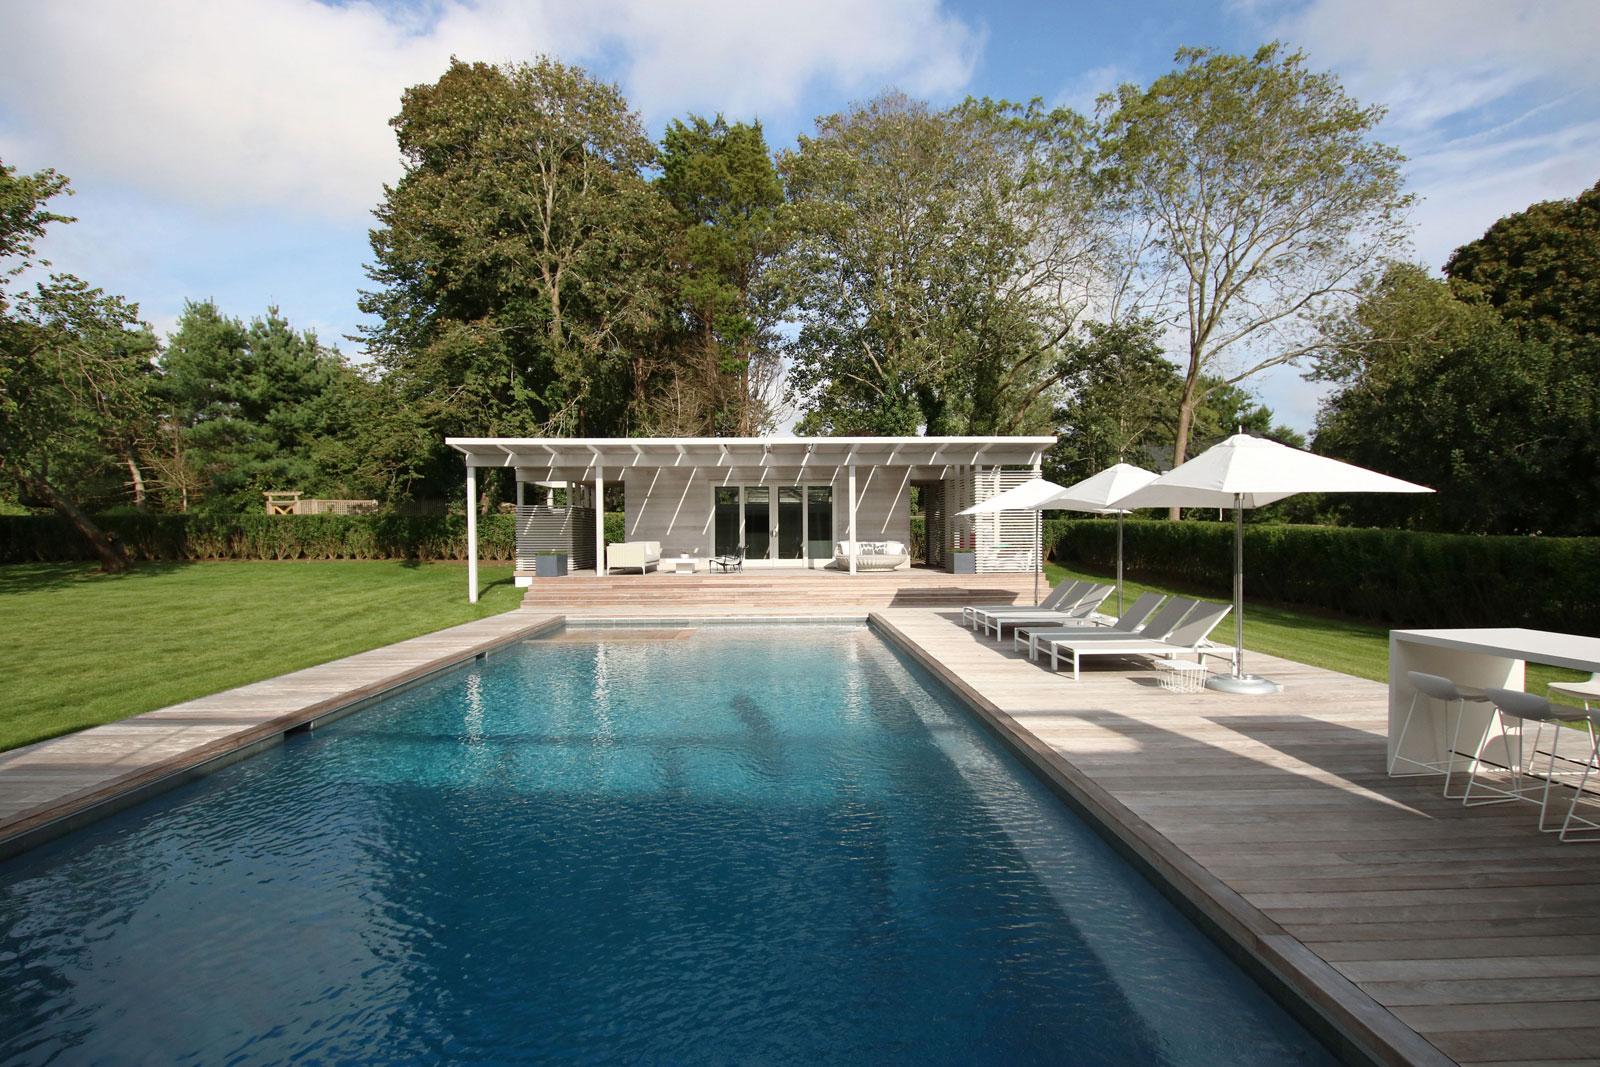 25-re4a-resolution-4-architecture-modern-modular-prefab-bridgehampton house-exterior-pool-house.jpg